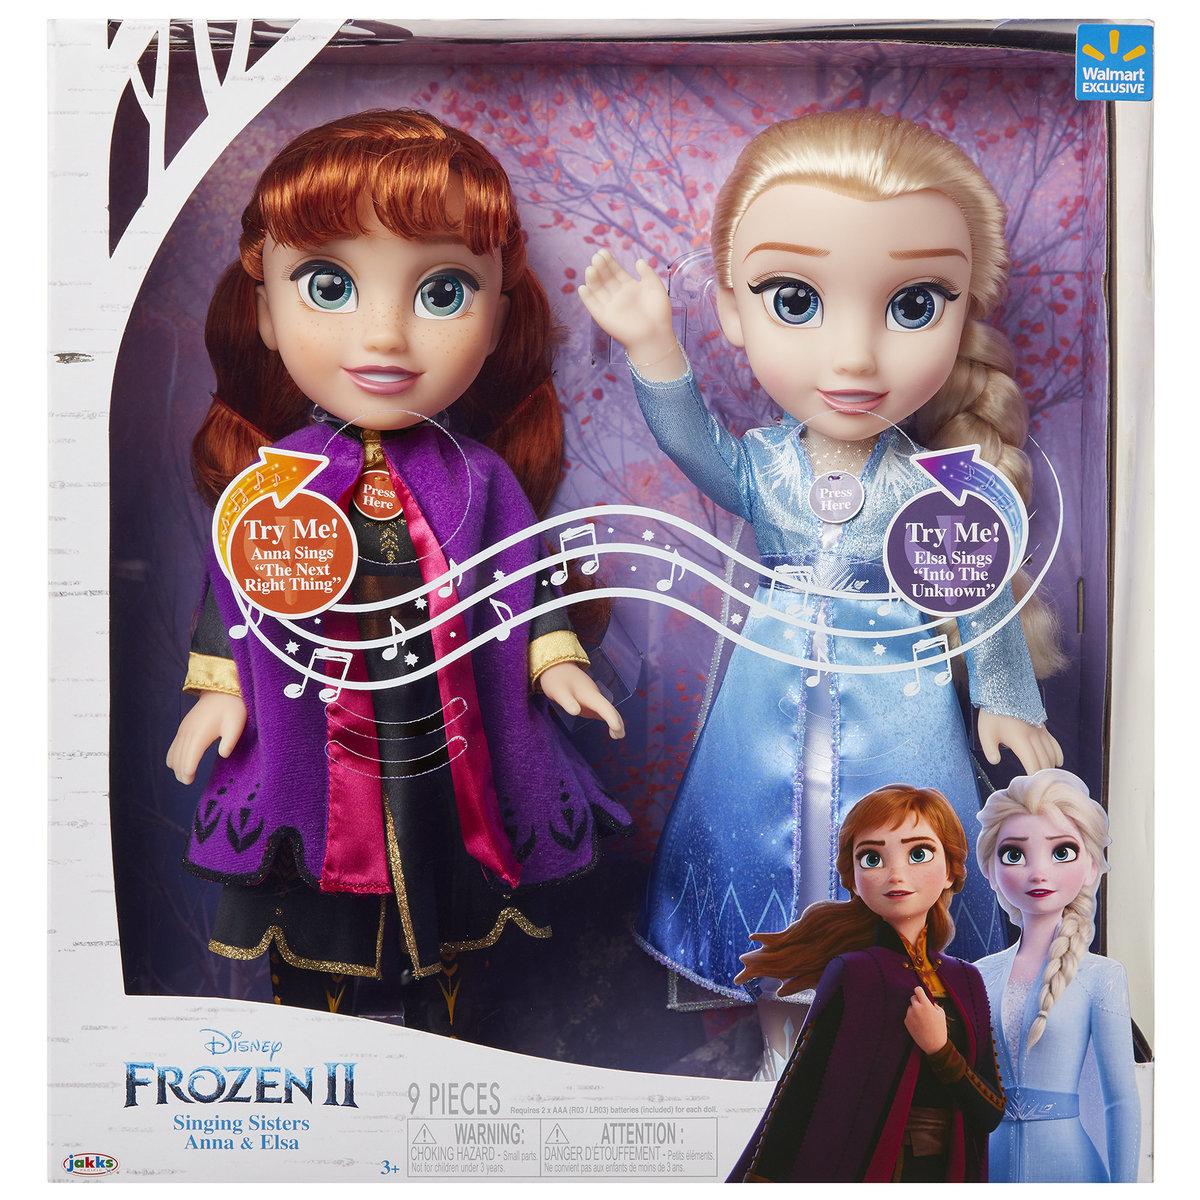 Frozen 2 - Singing Sisters - 2 pack [Licensed by Disney]